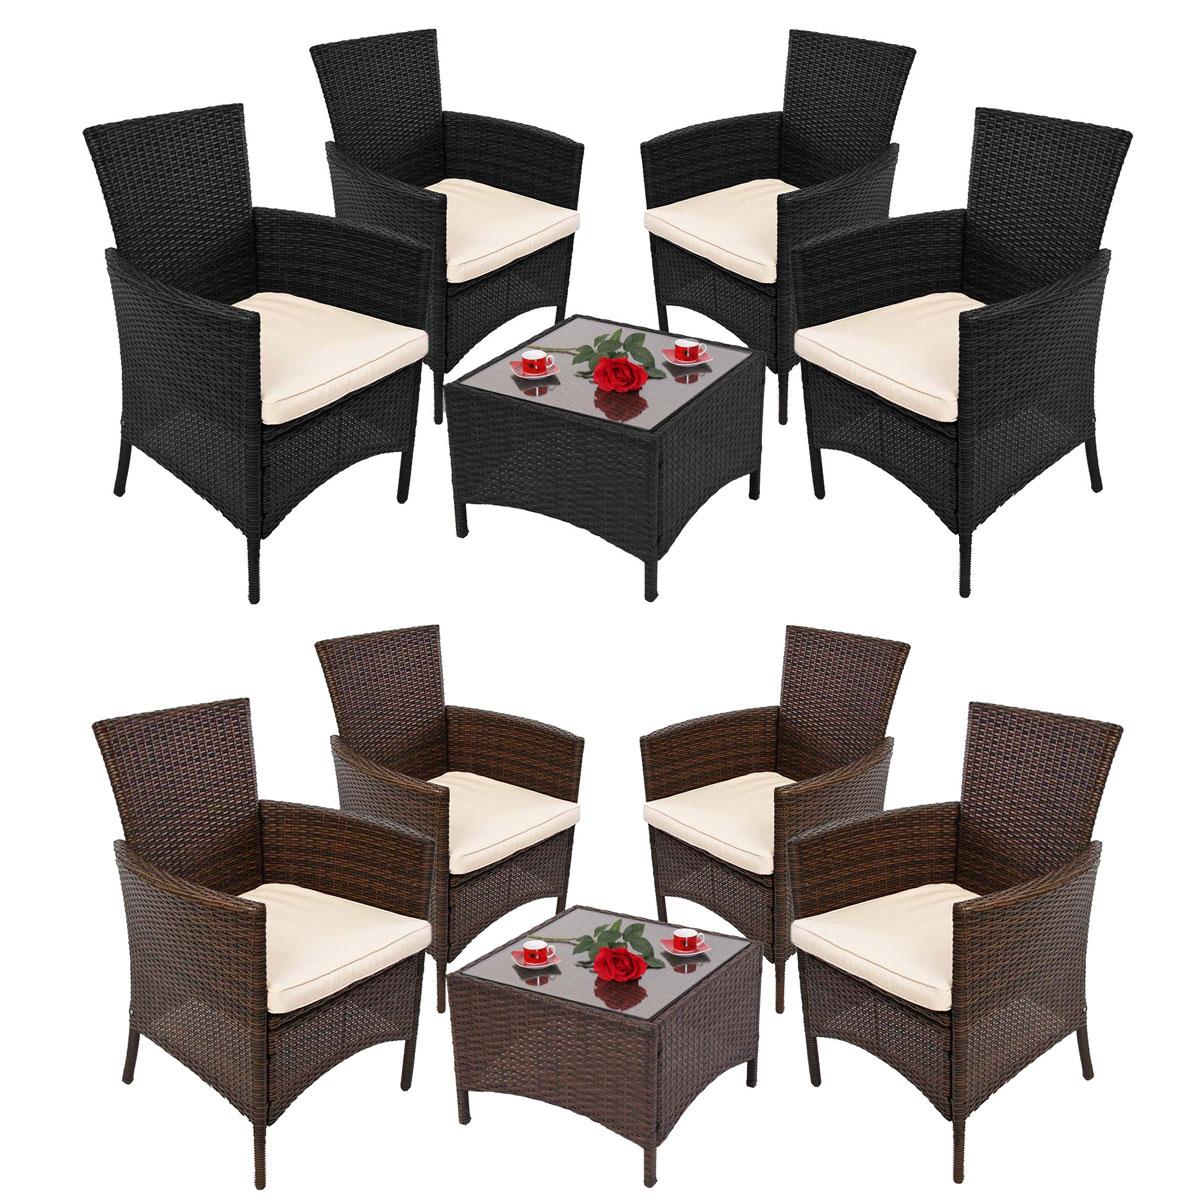 Garten-Garnitur RomV, Poly-Rattan, Tisch eckig + 4x Sessel ~ Variantenangebot